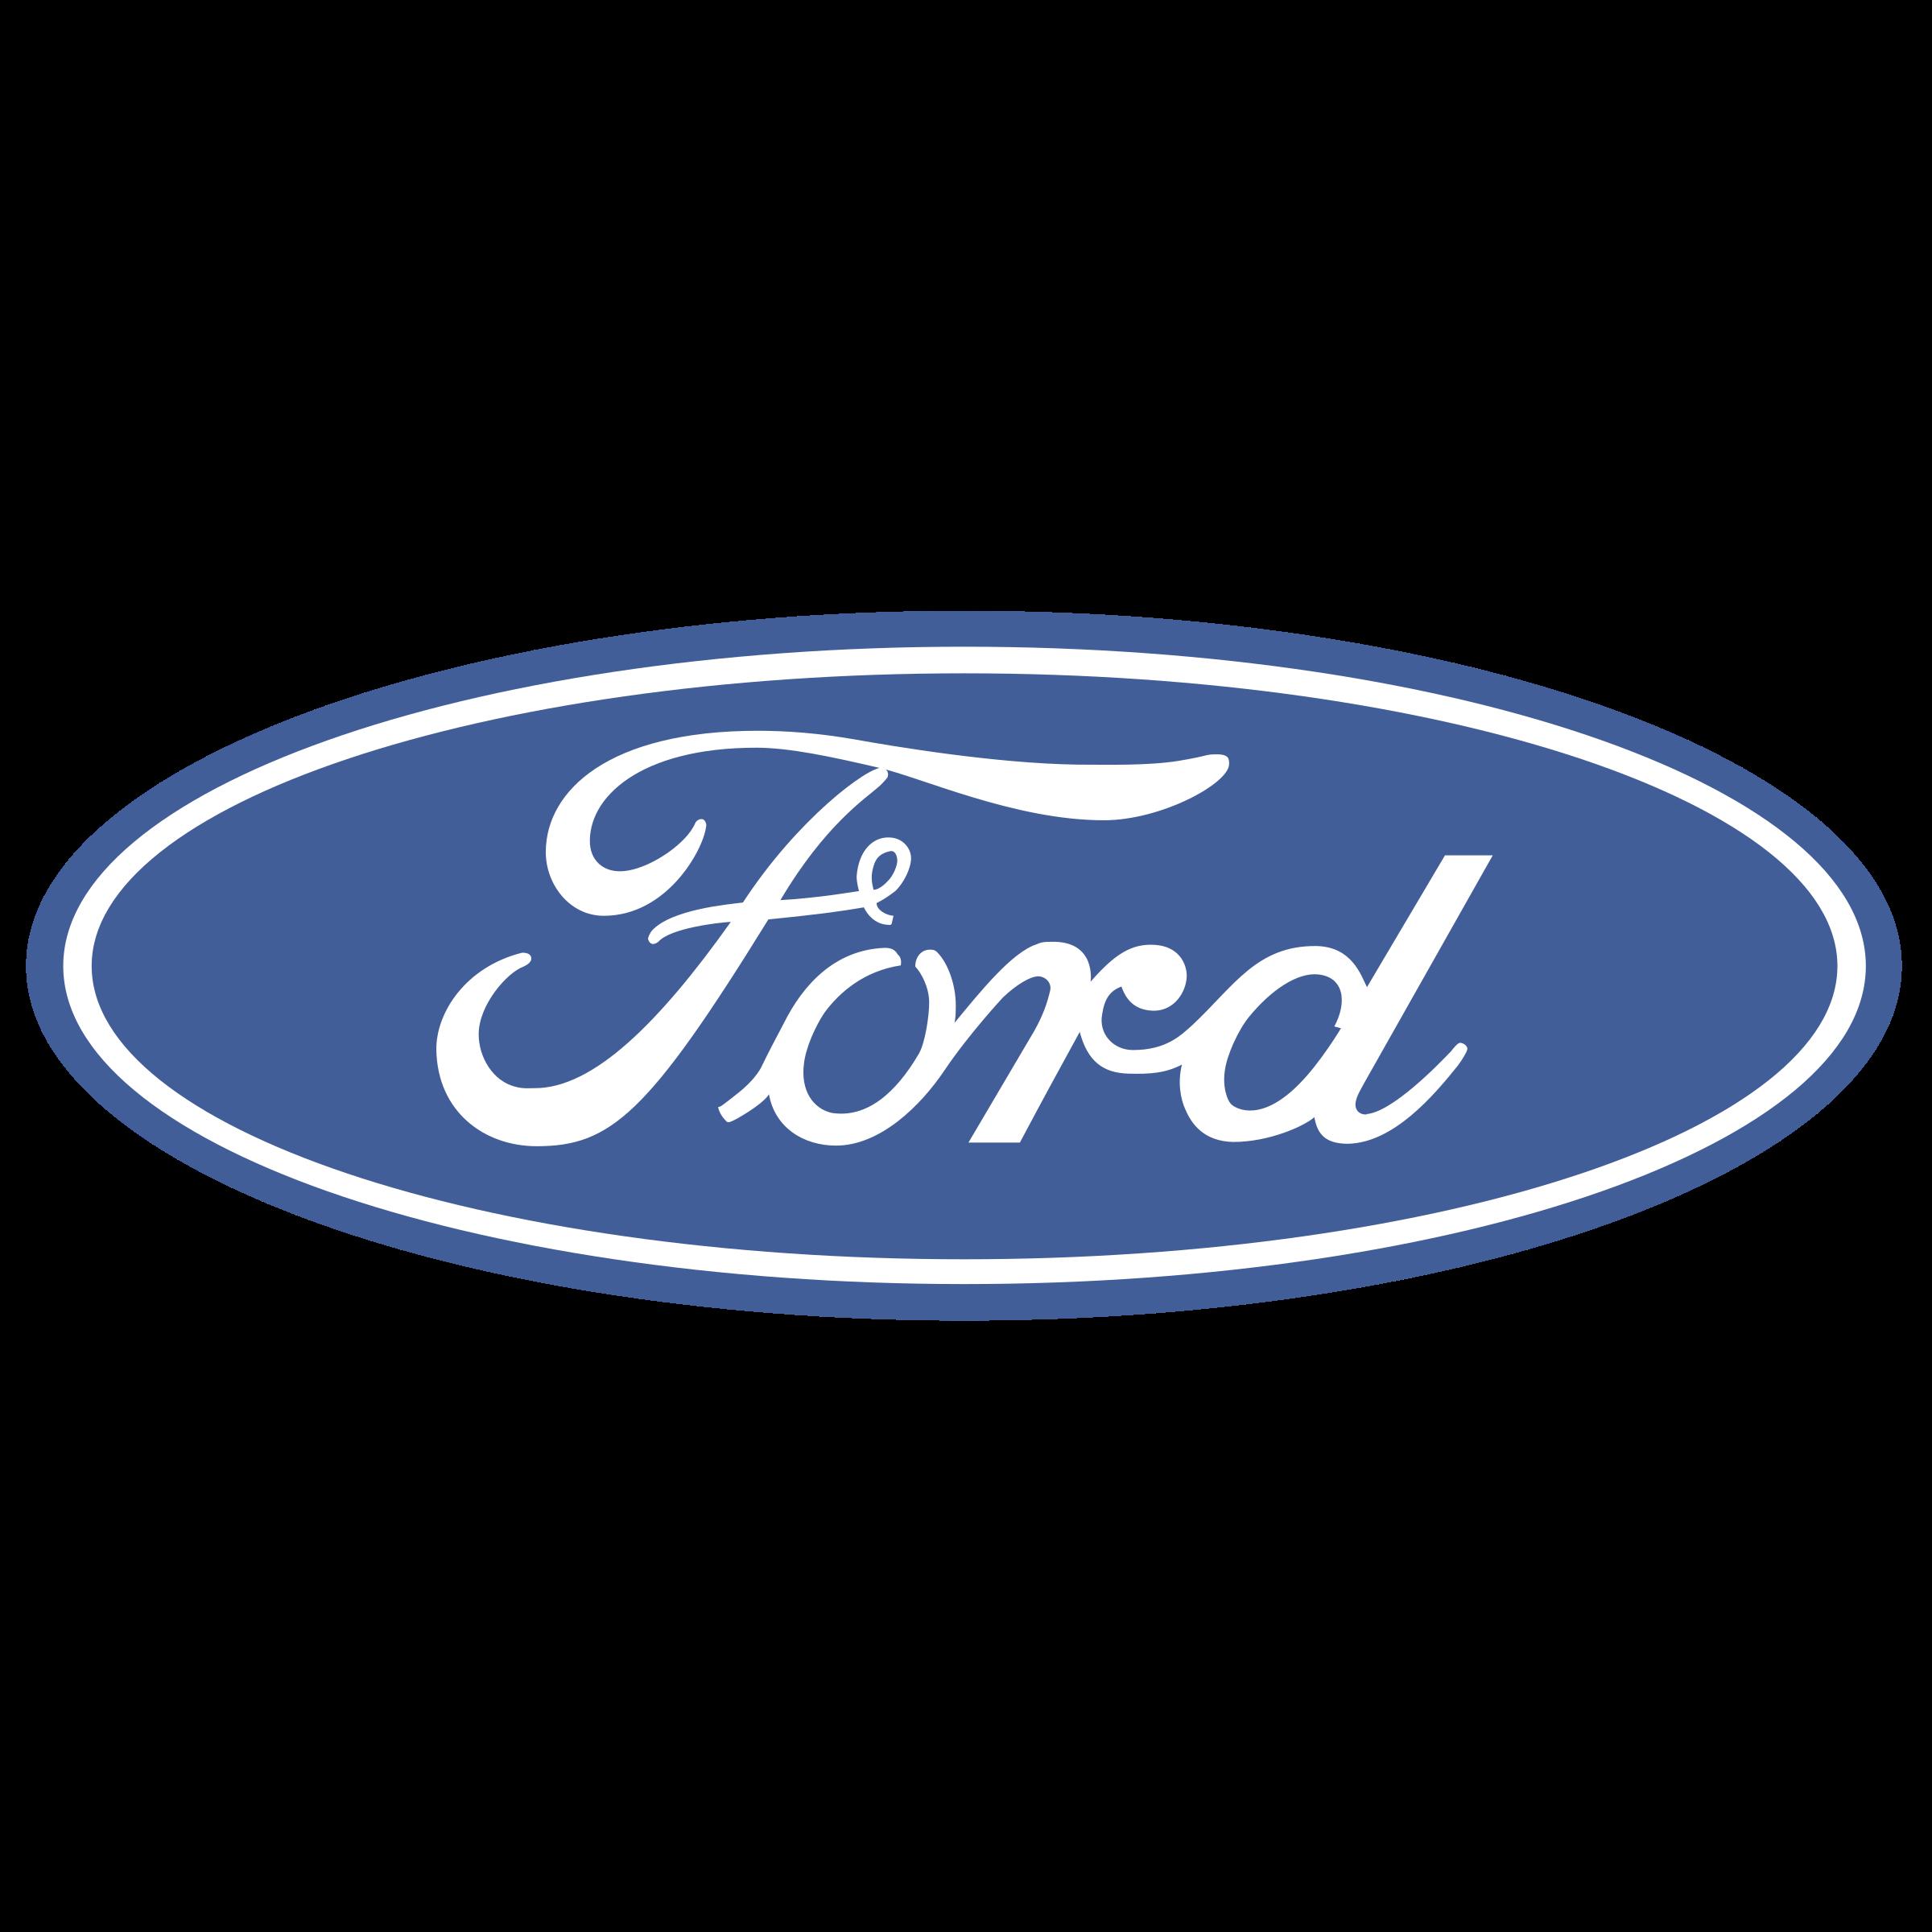 ford-1-logo-png-transparent.png